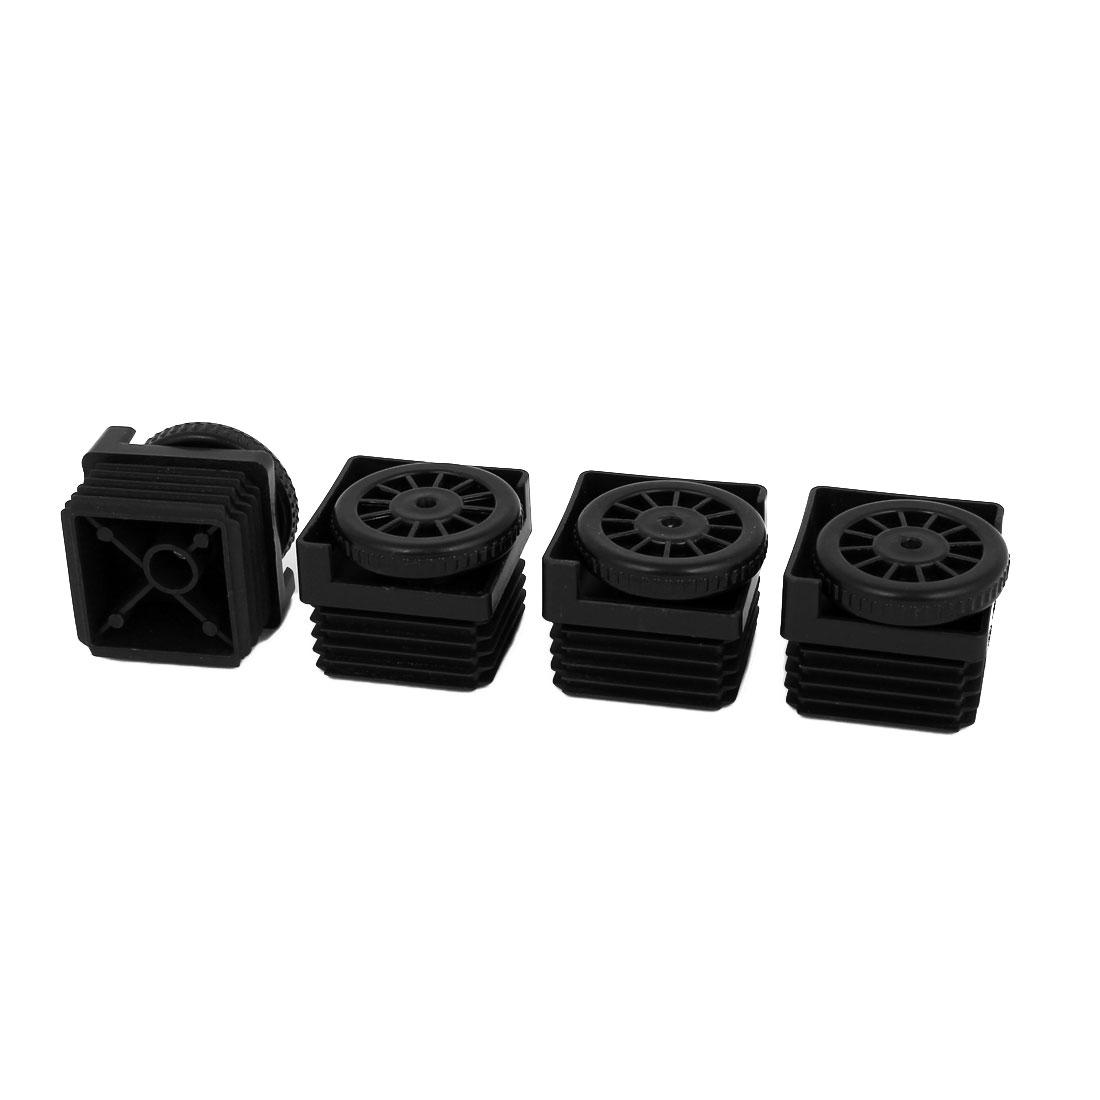 8mm Thread Dia. Adjustable Plastic Square Foot Pad for Furniture Black 4Pcs